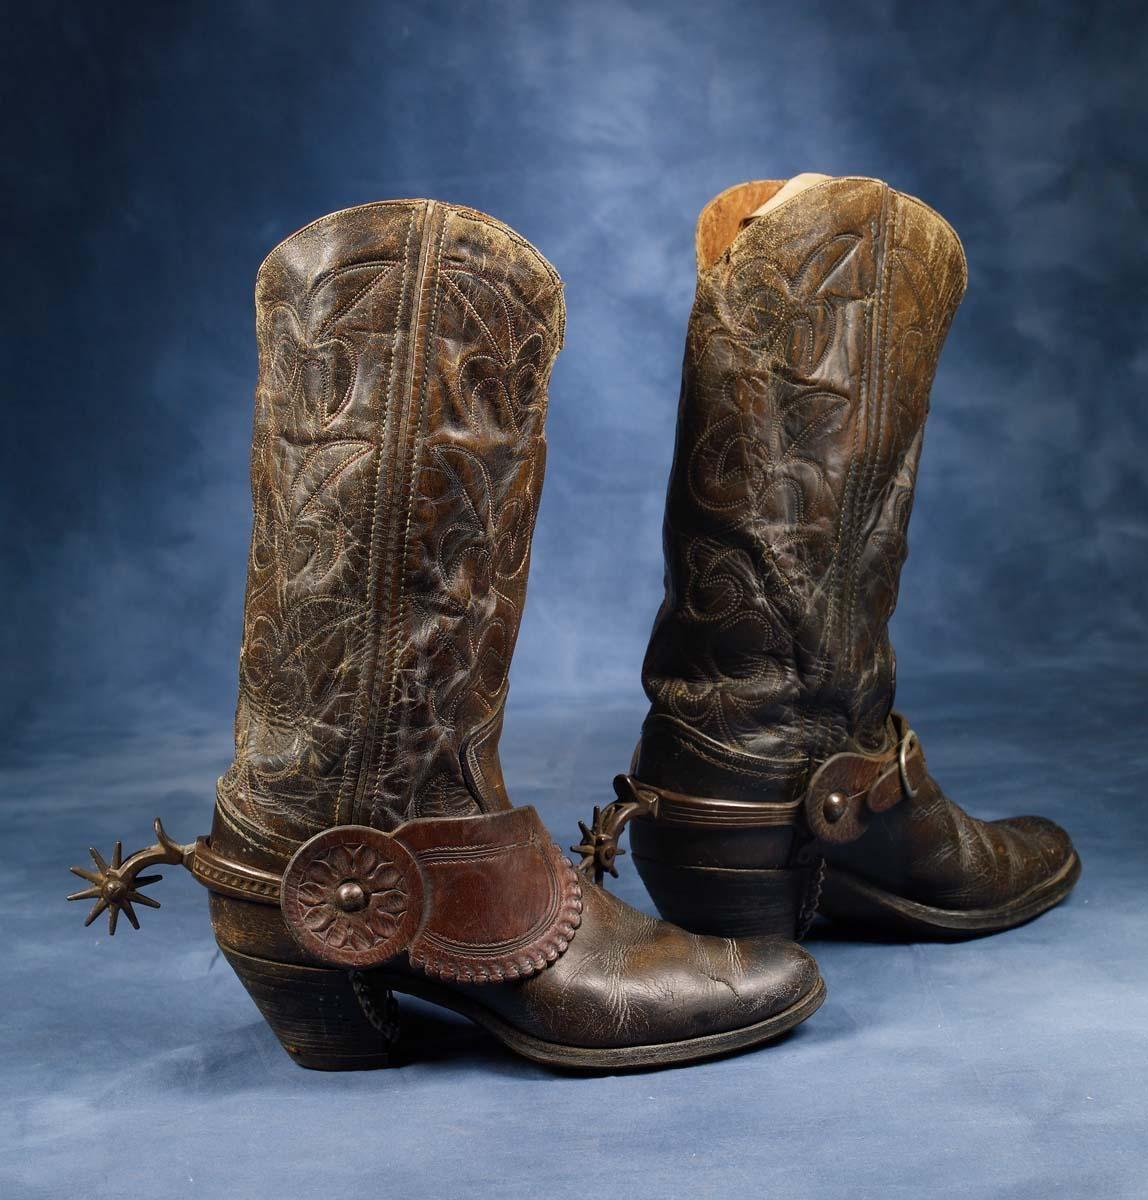 165fa704a03 cowboy boots & spurs - Google Search | Cowboys & Boots | Cowboy ...